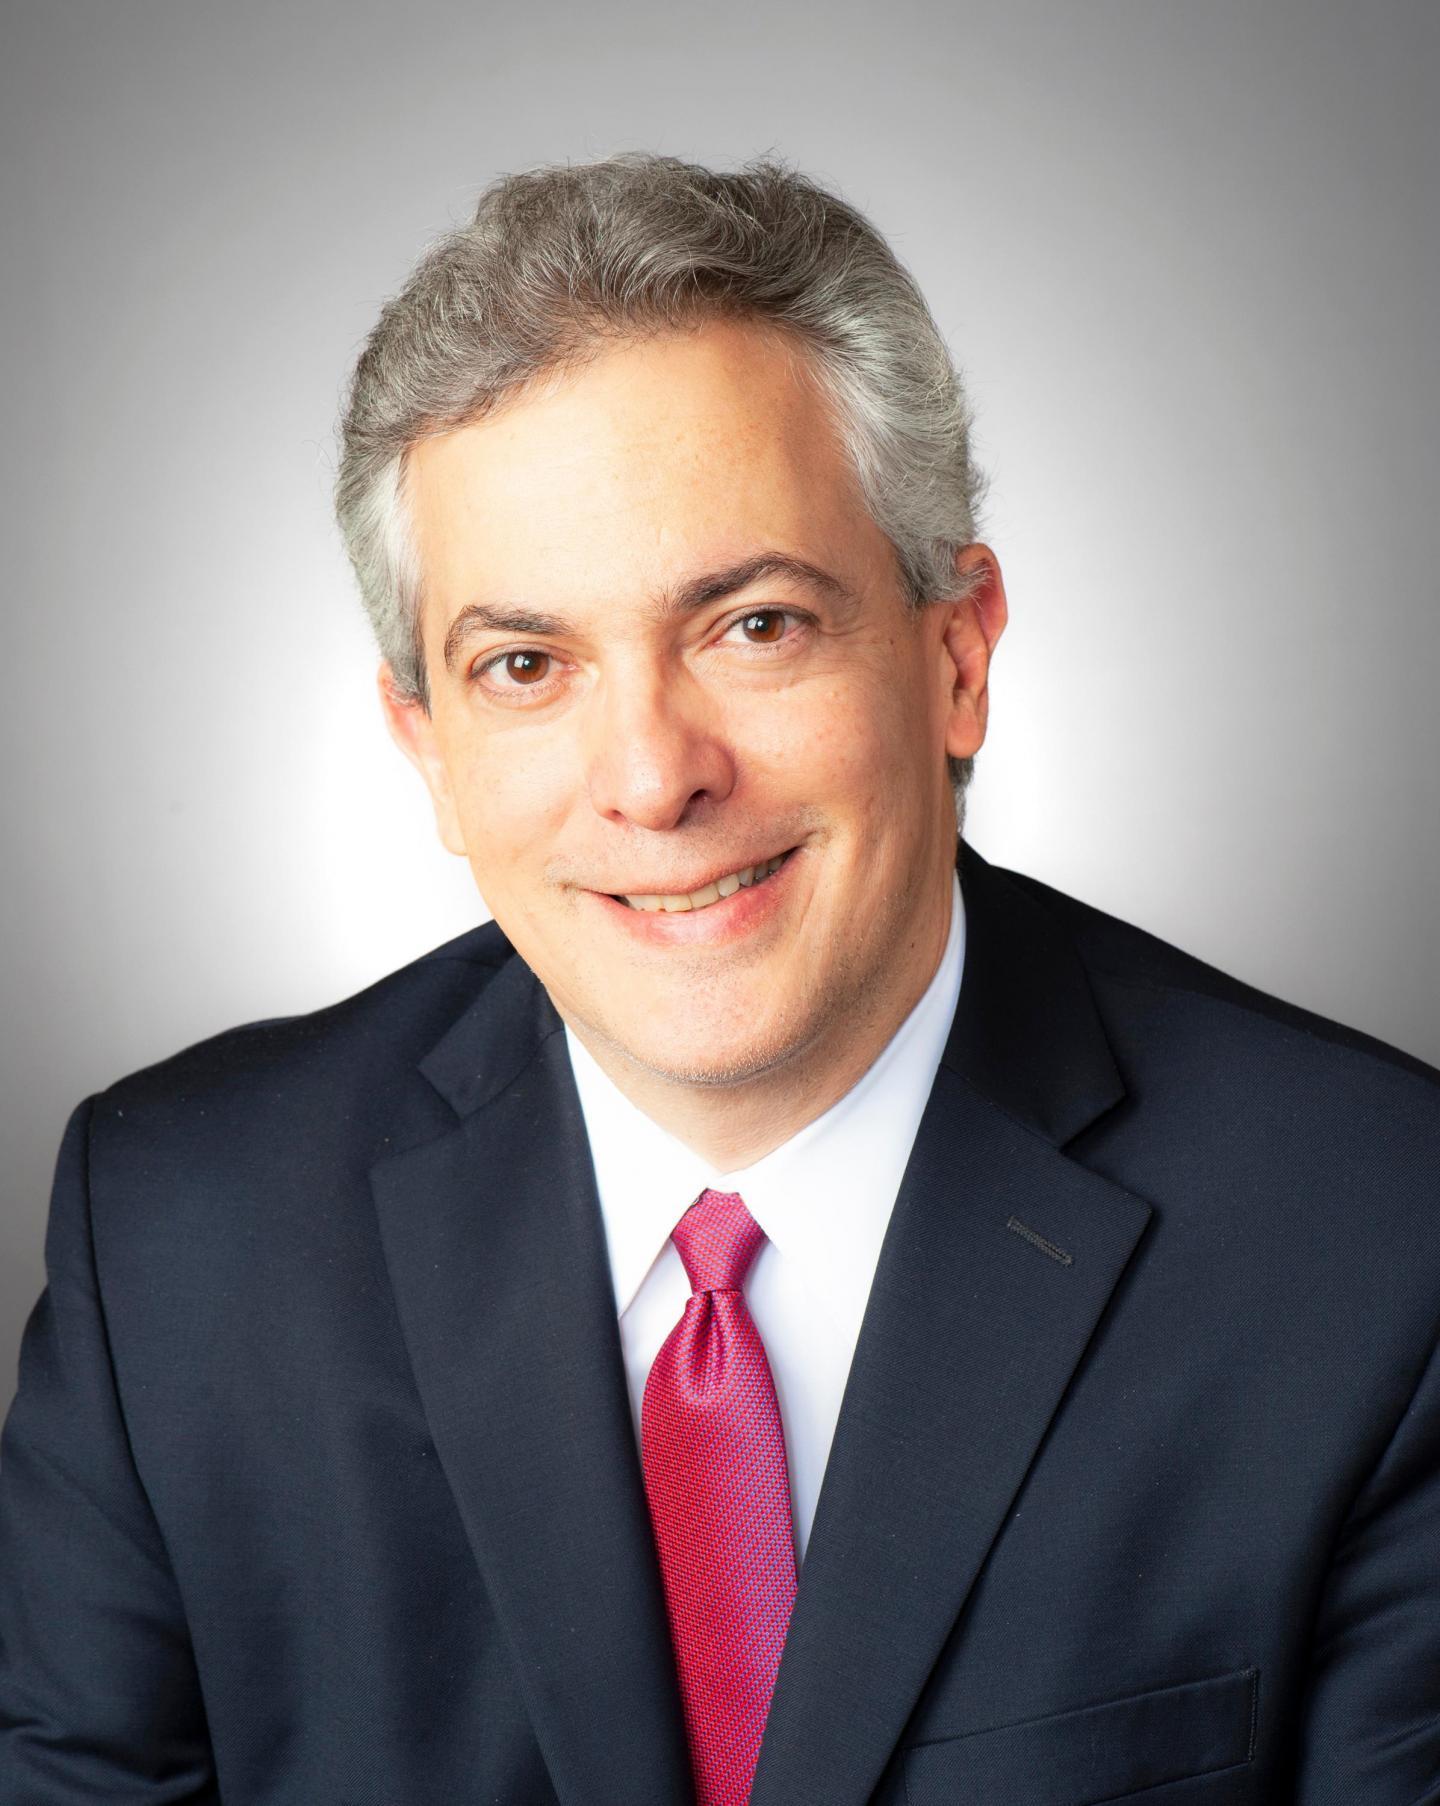 Juan C. Celedón, M.D., Dr.P.H., University of Pittsburgh